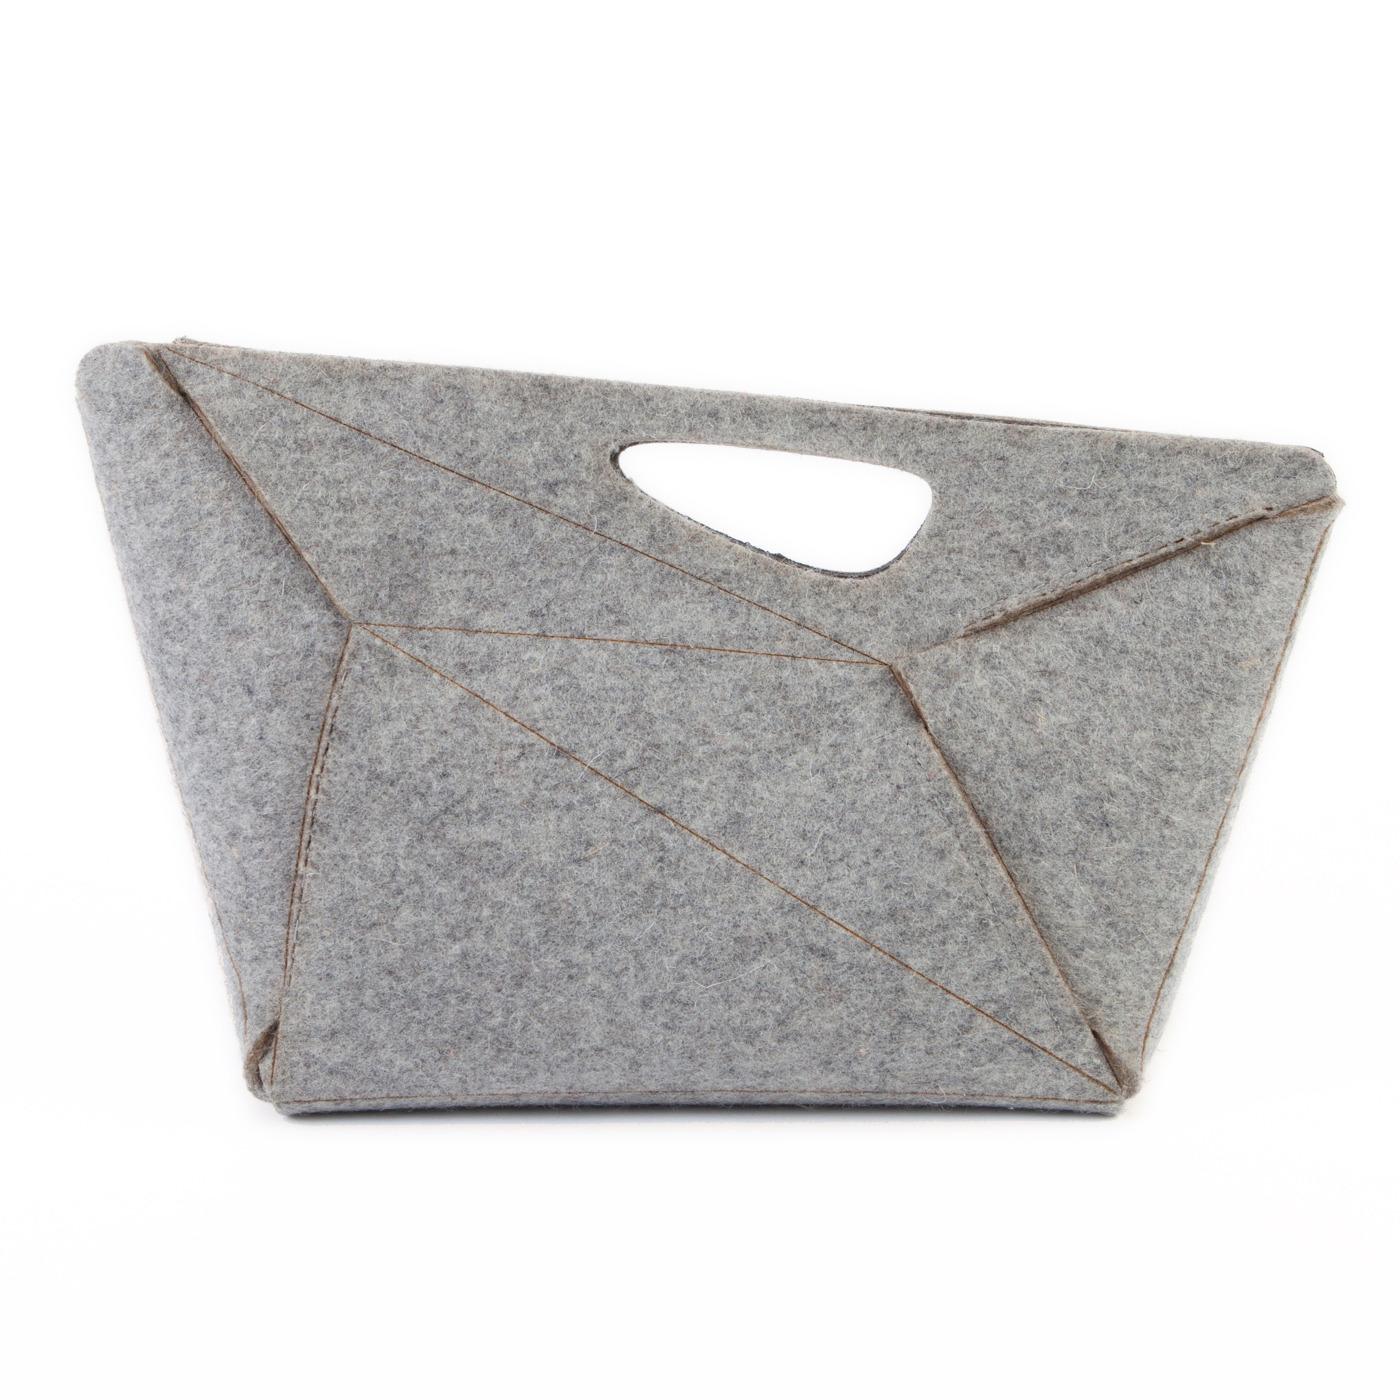 Artisan, Eco-Friendly, Designer Fresh Angles Clutch